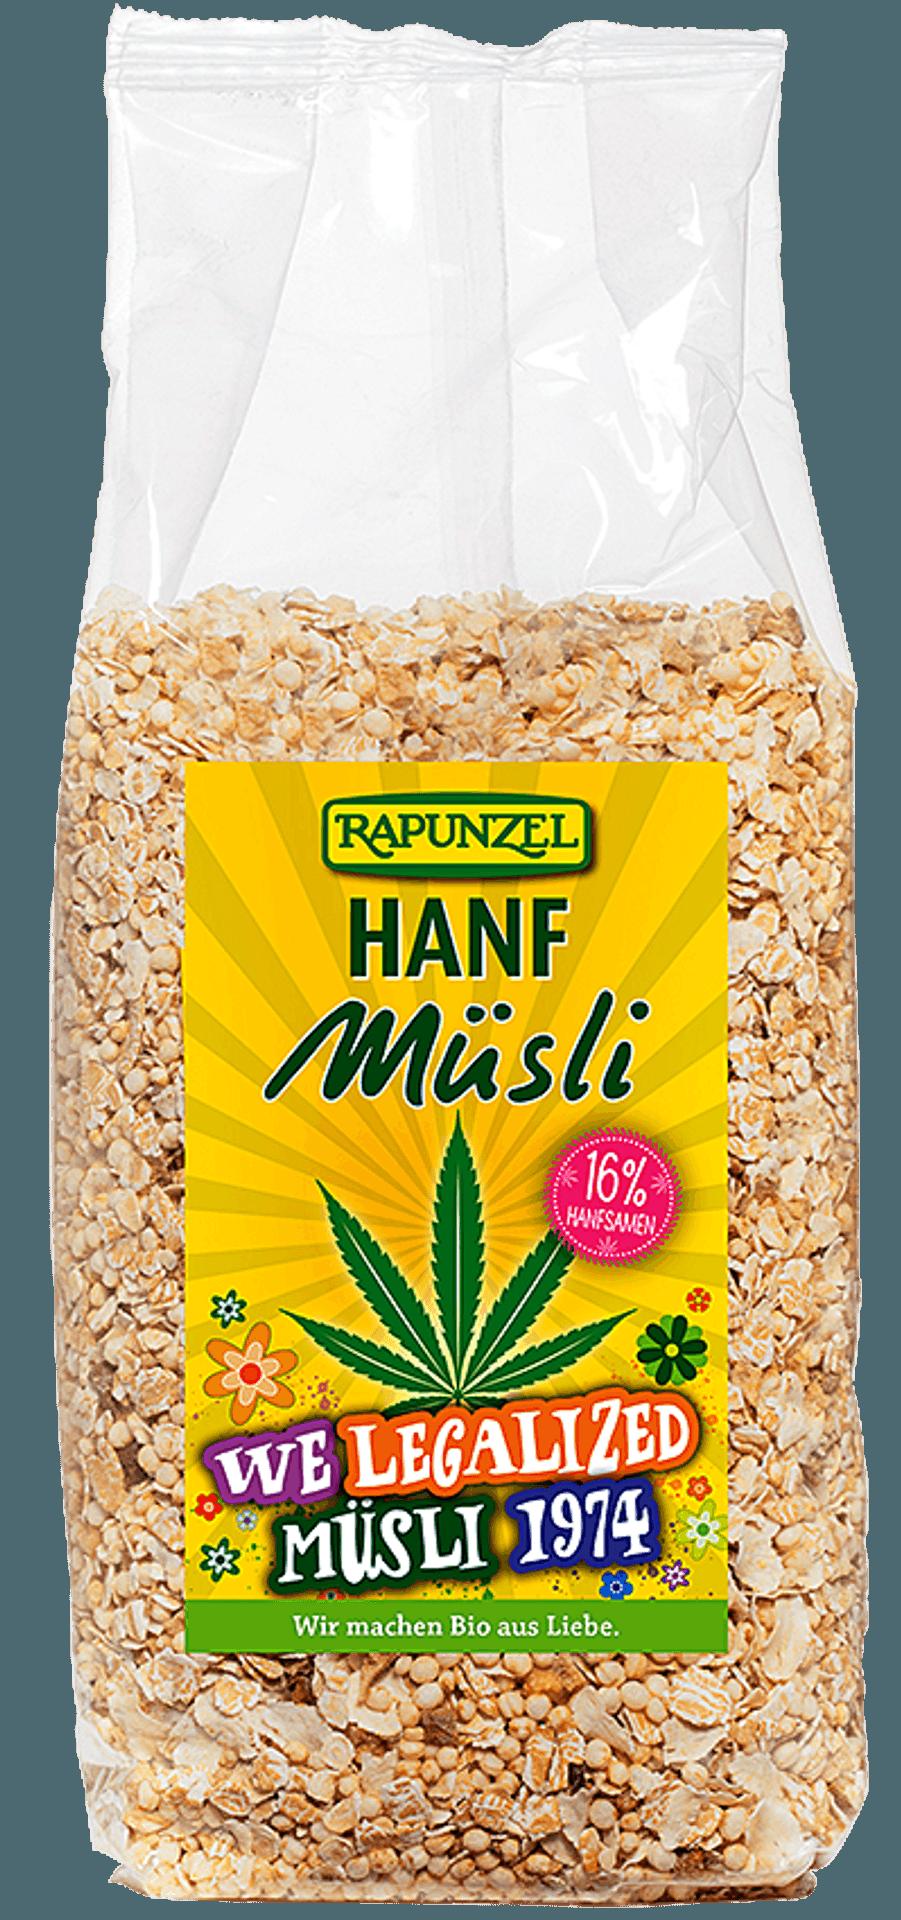 Hanf-Müsli